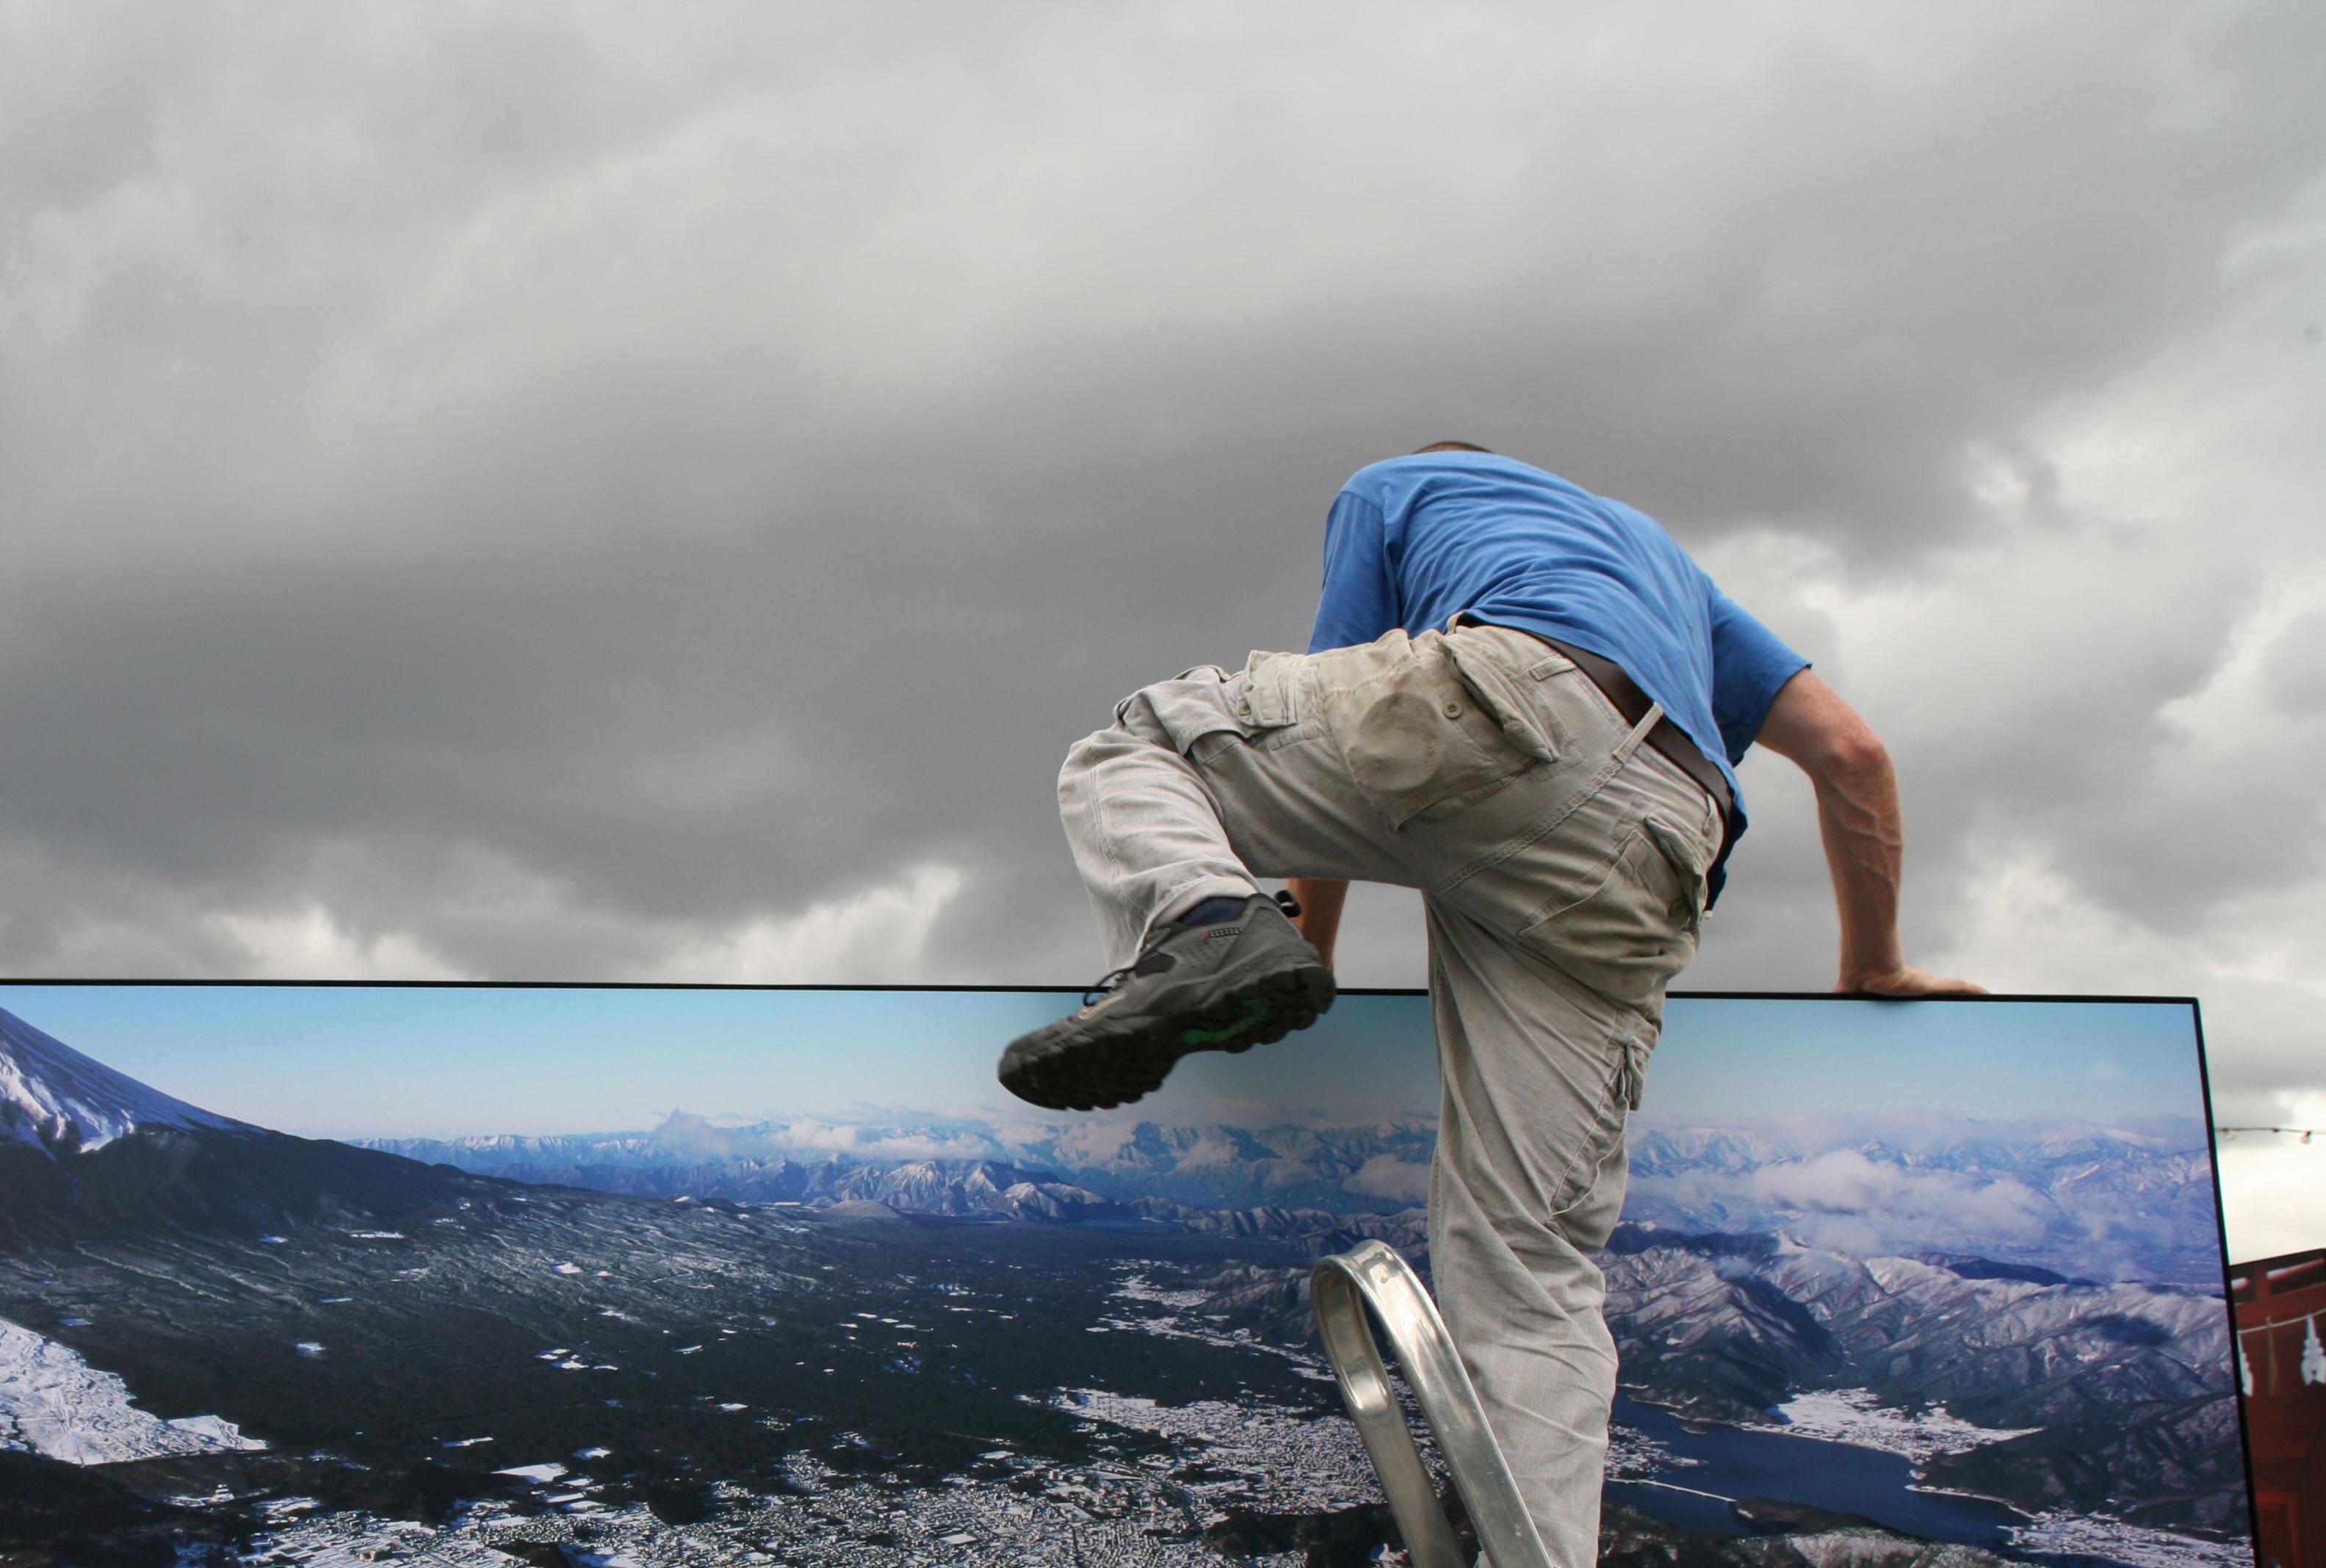 Standard8 installation of Magnum photographer Hiroji Kubota exhibition, London Riverside